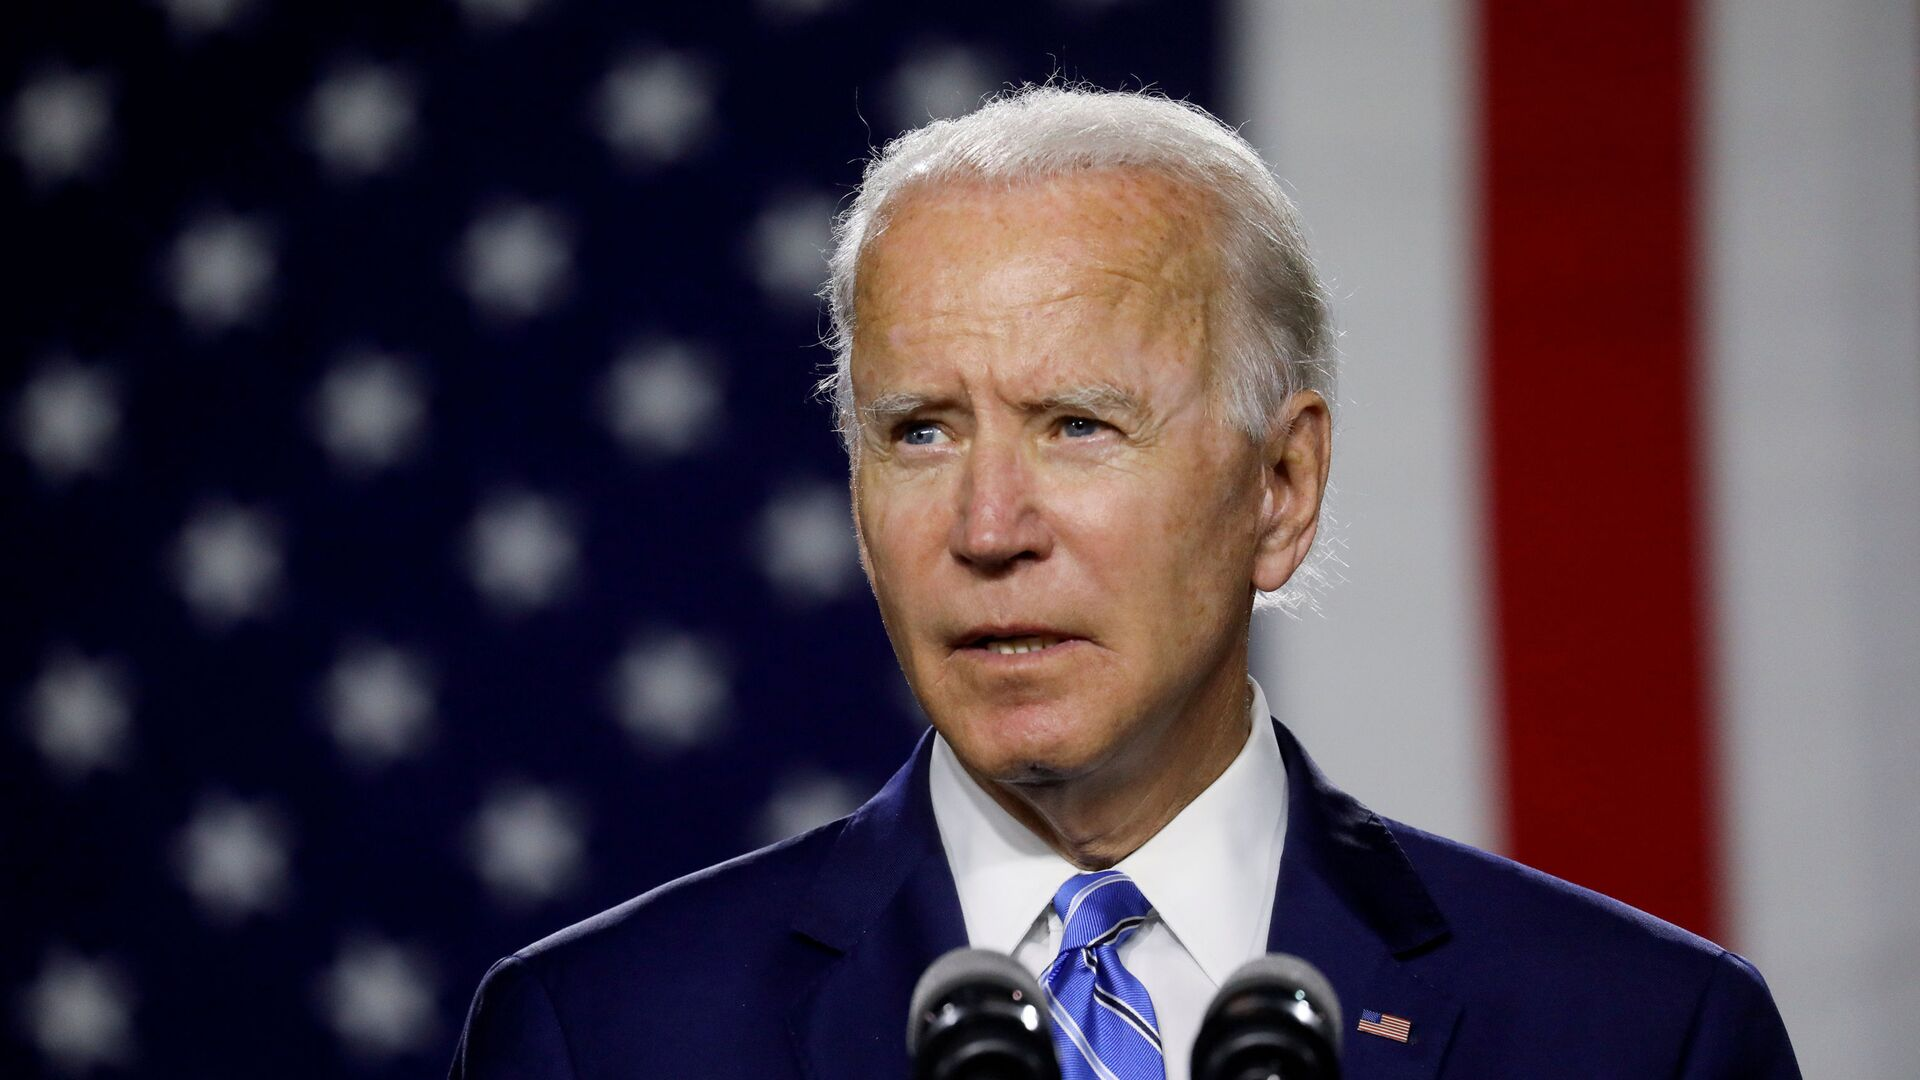 Joe Biden, presidente electo de Estados Unidos - Sputnik Mundo, 1920, 05.03.2021